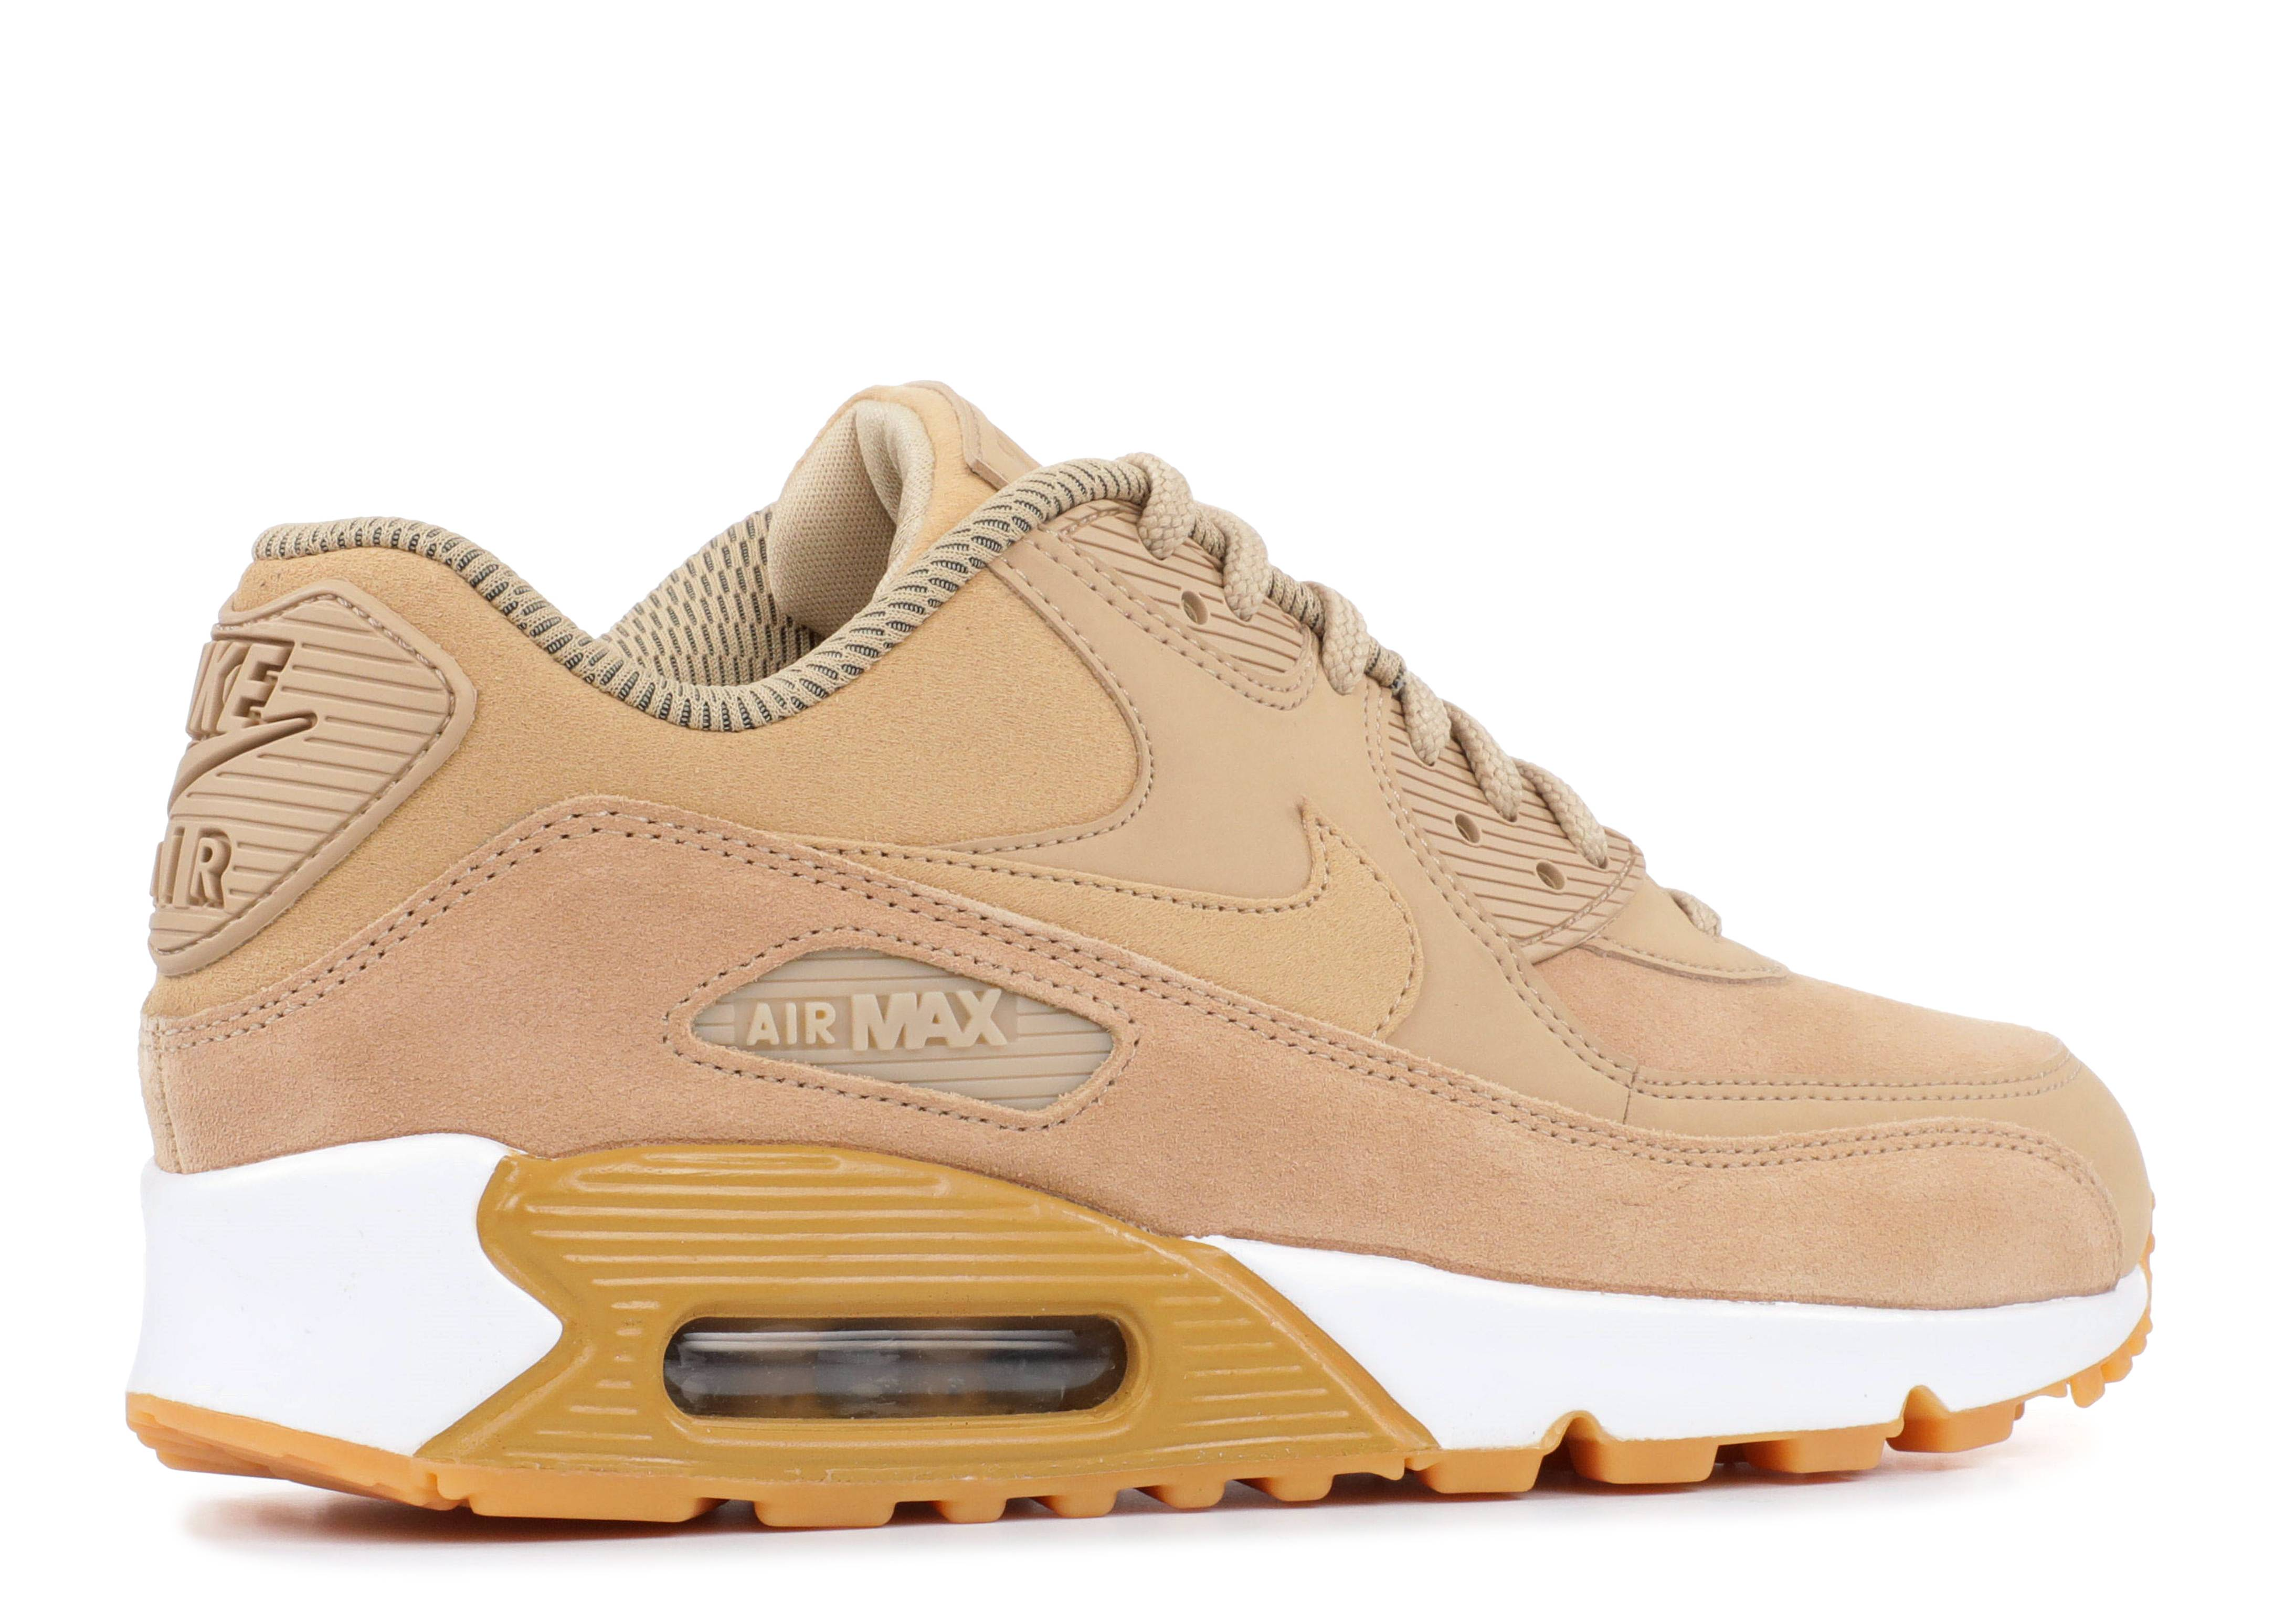 Wmns Air Max 90 SE 'Mushroom' - Nike - 881105 200 - mushroom/gum ...